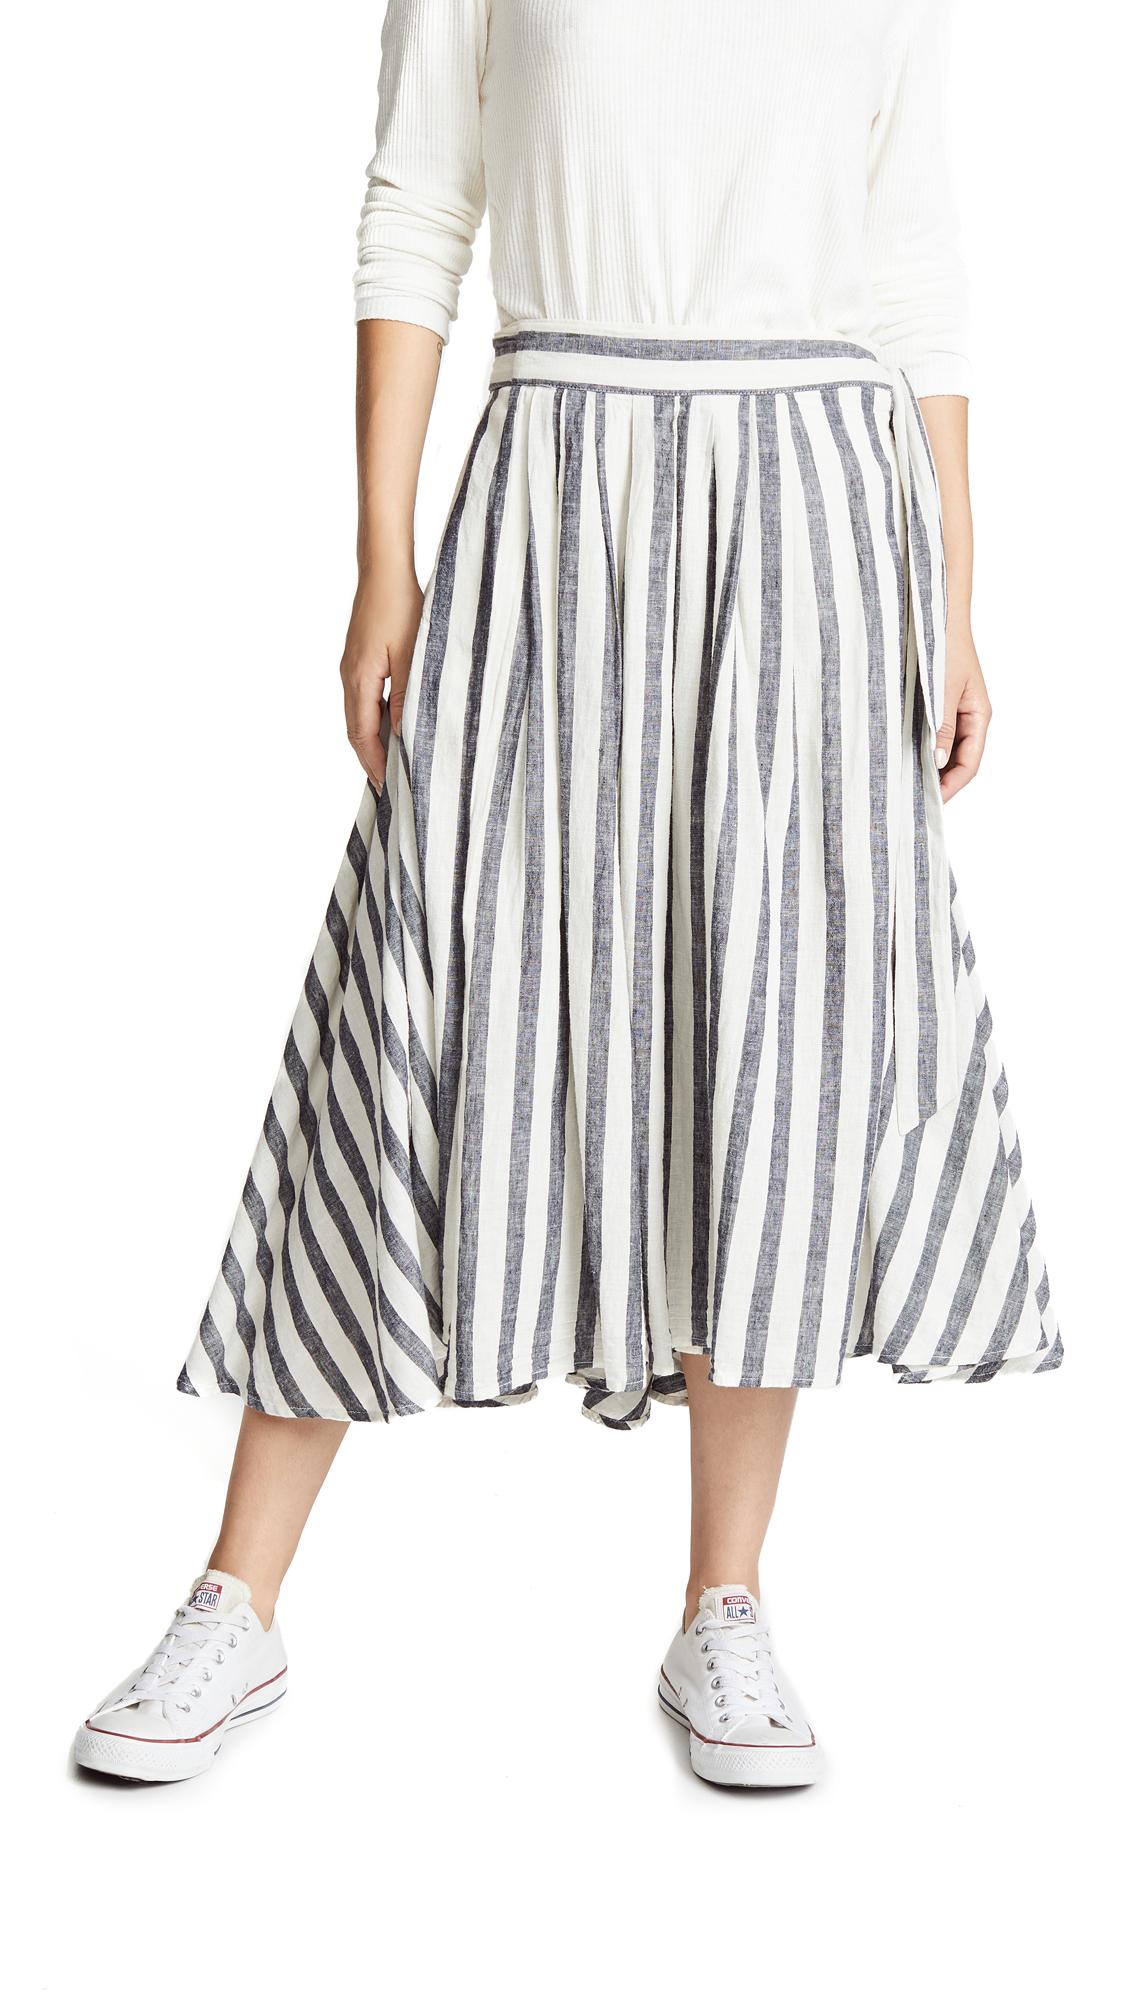 BIRDS OF PARADIS Jenna Wrap Skirt in Black/White Stripe